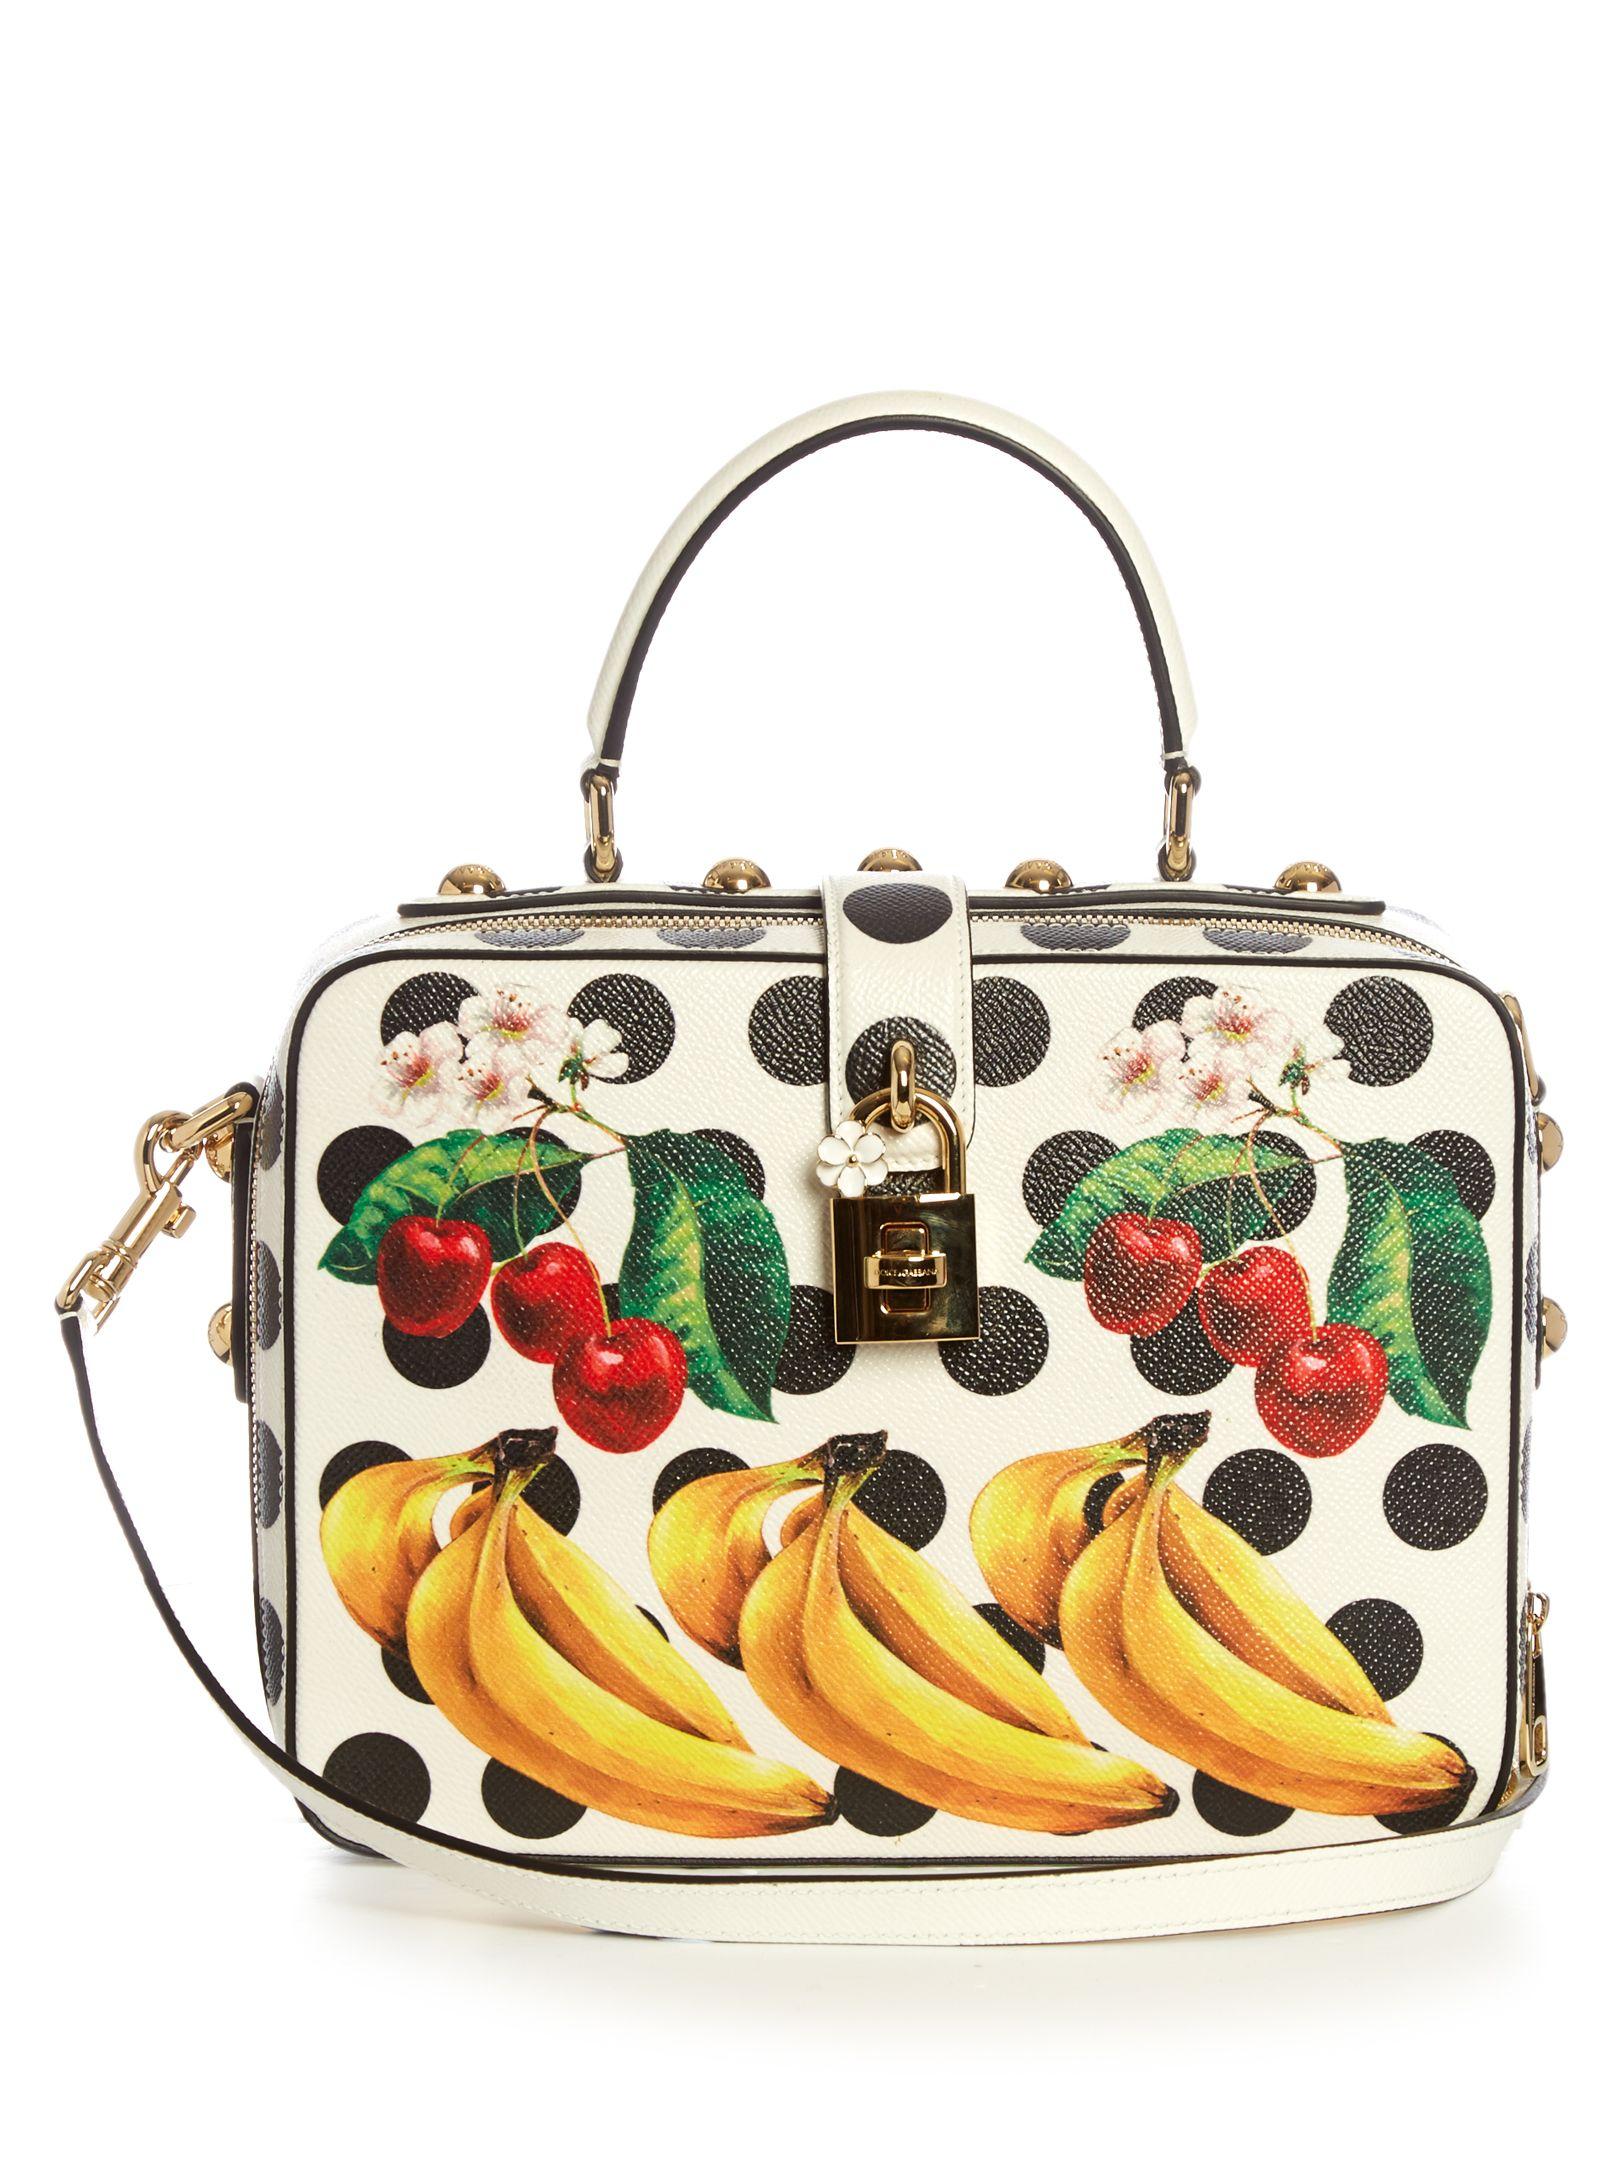 DOLCE   GABBANA Dolce Box polka-dot print leather bag   handbag ... 3f33fdaec4